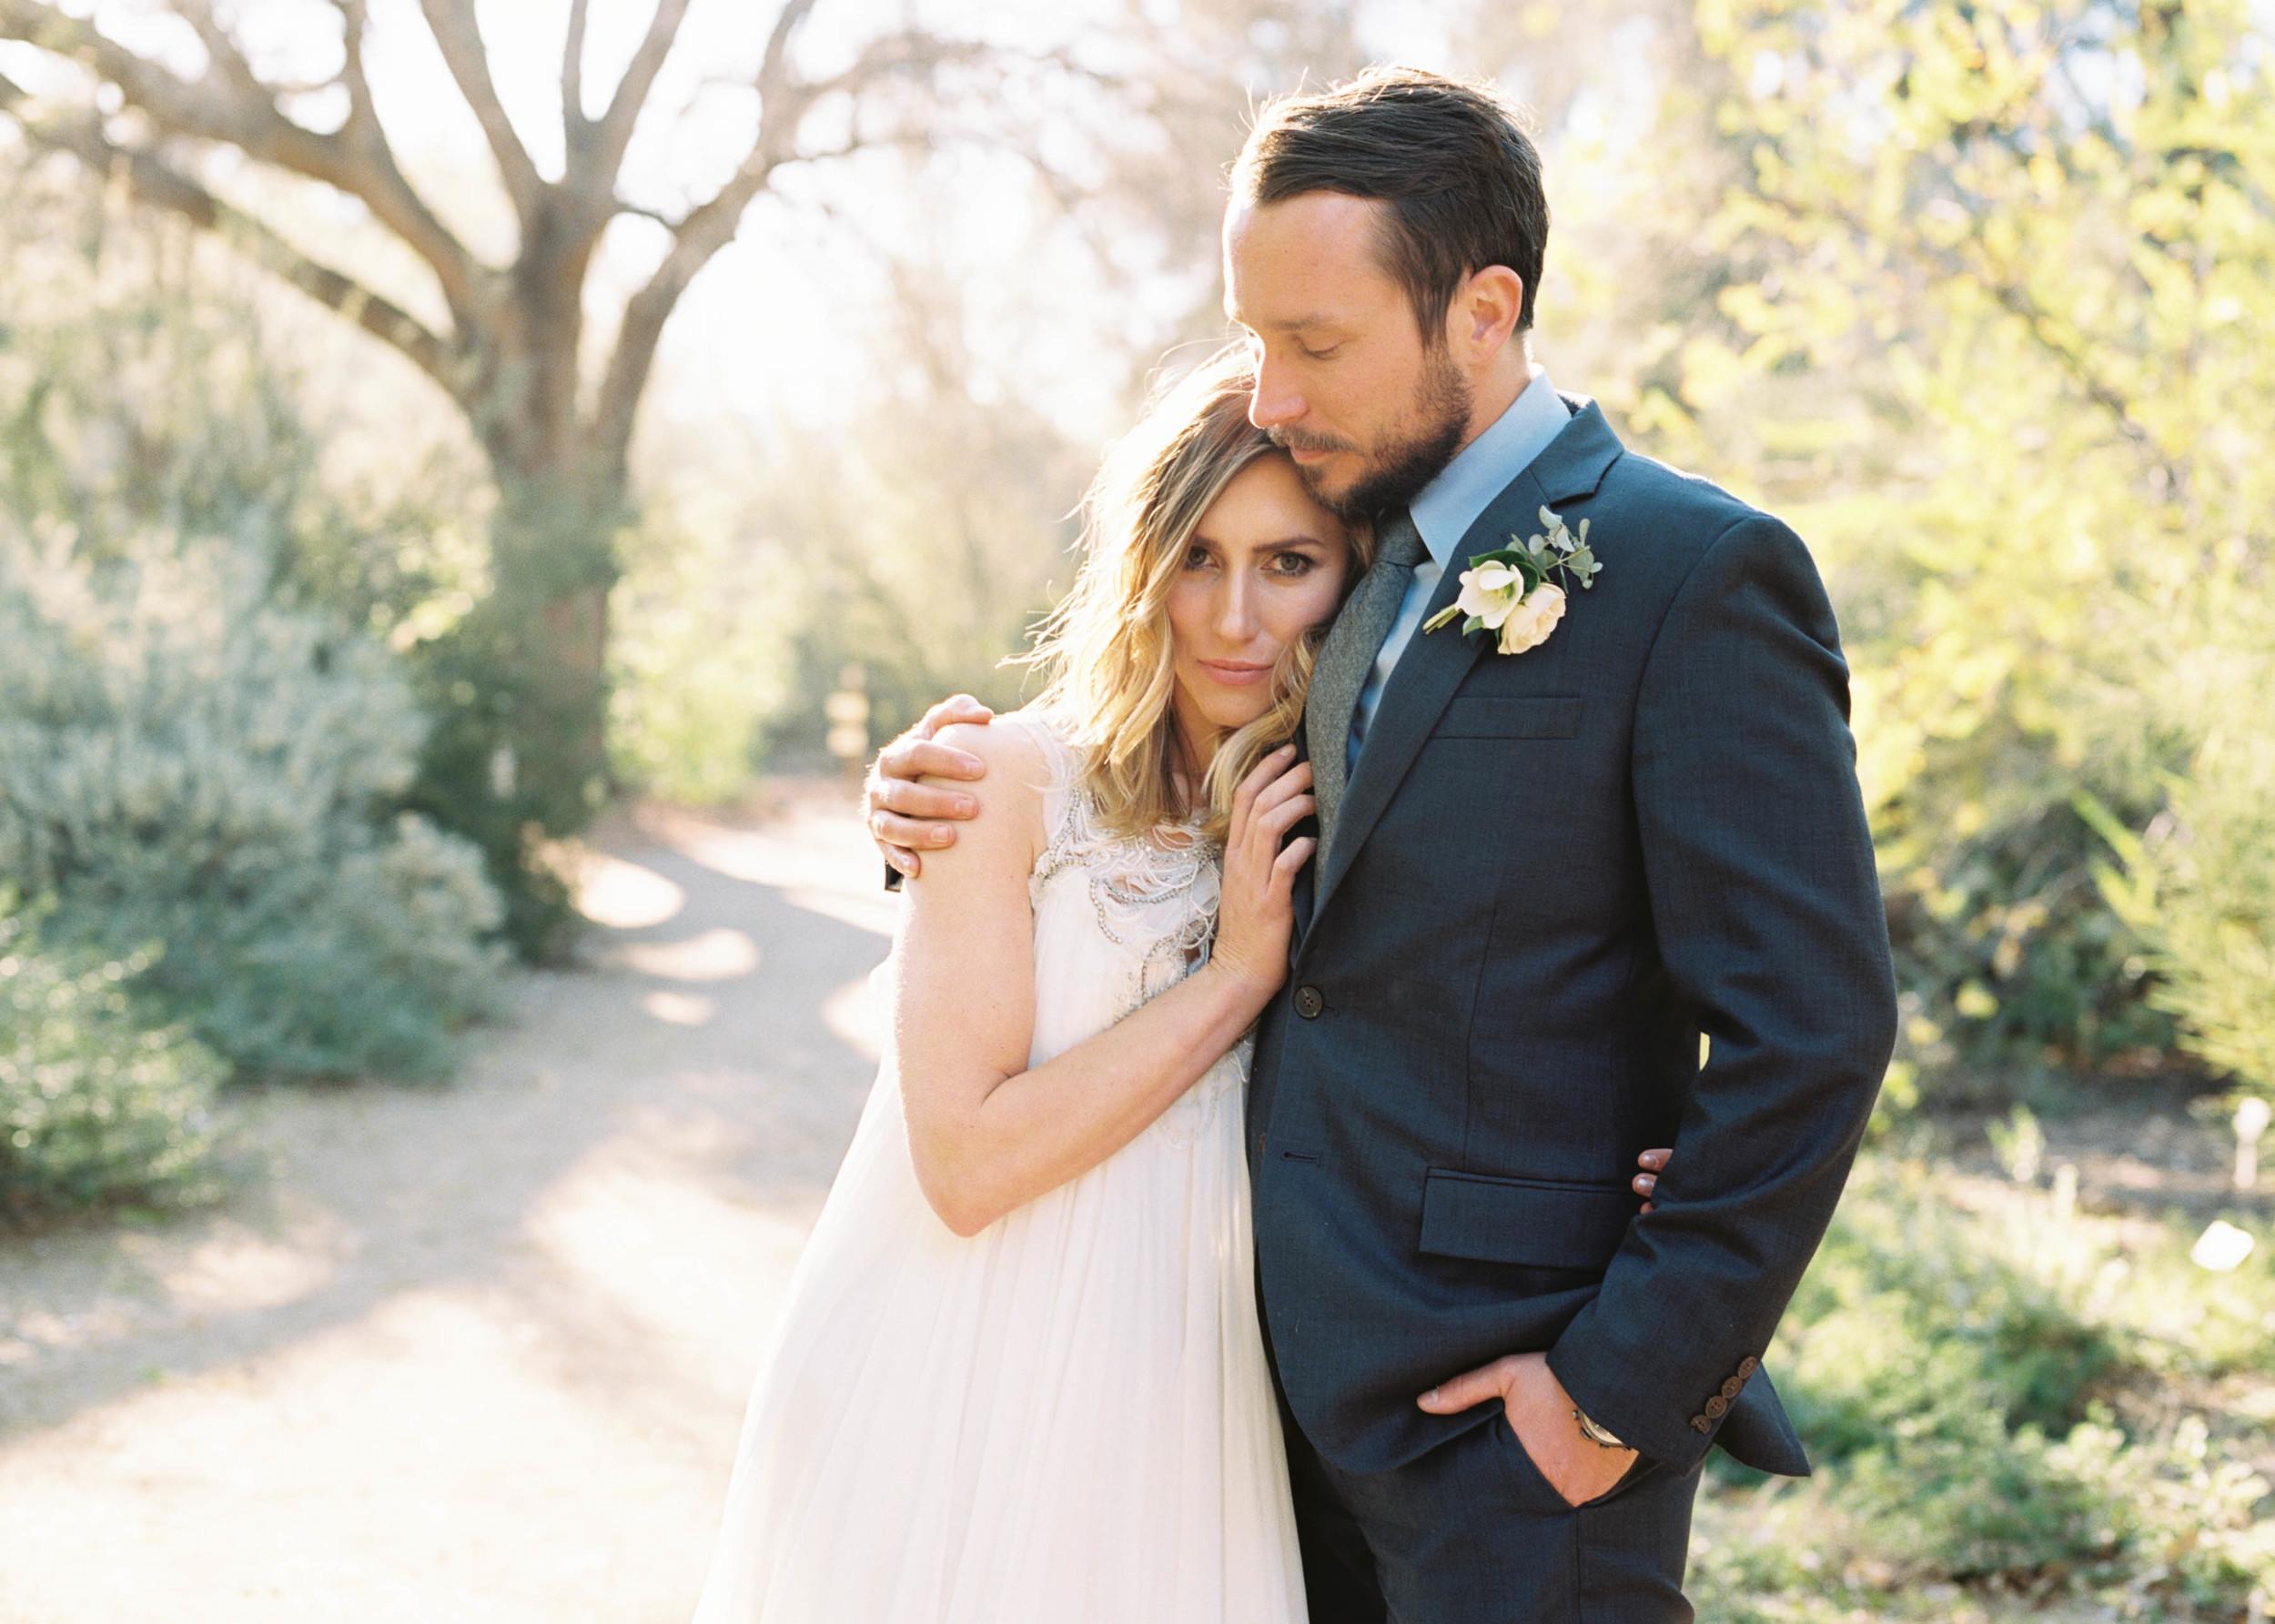 Danford-Photography-Bozeman-Montana-Arizona-Fine Art Film-Wedding-Engagement-Photographers-12.jpg